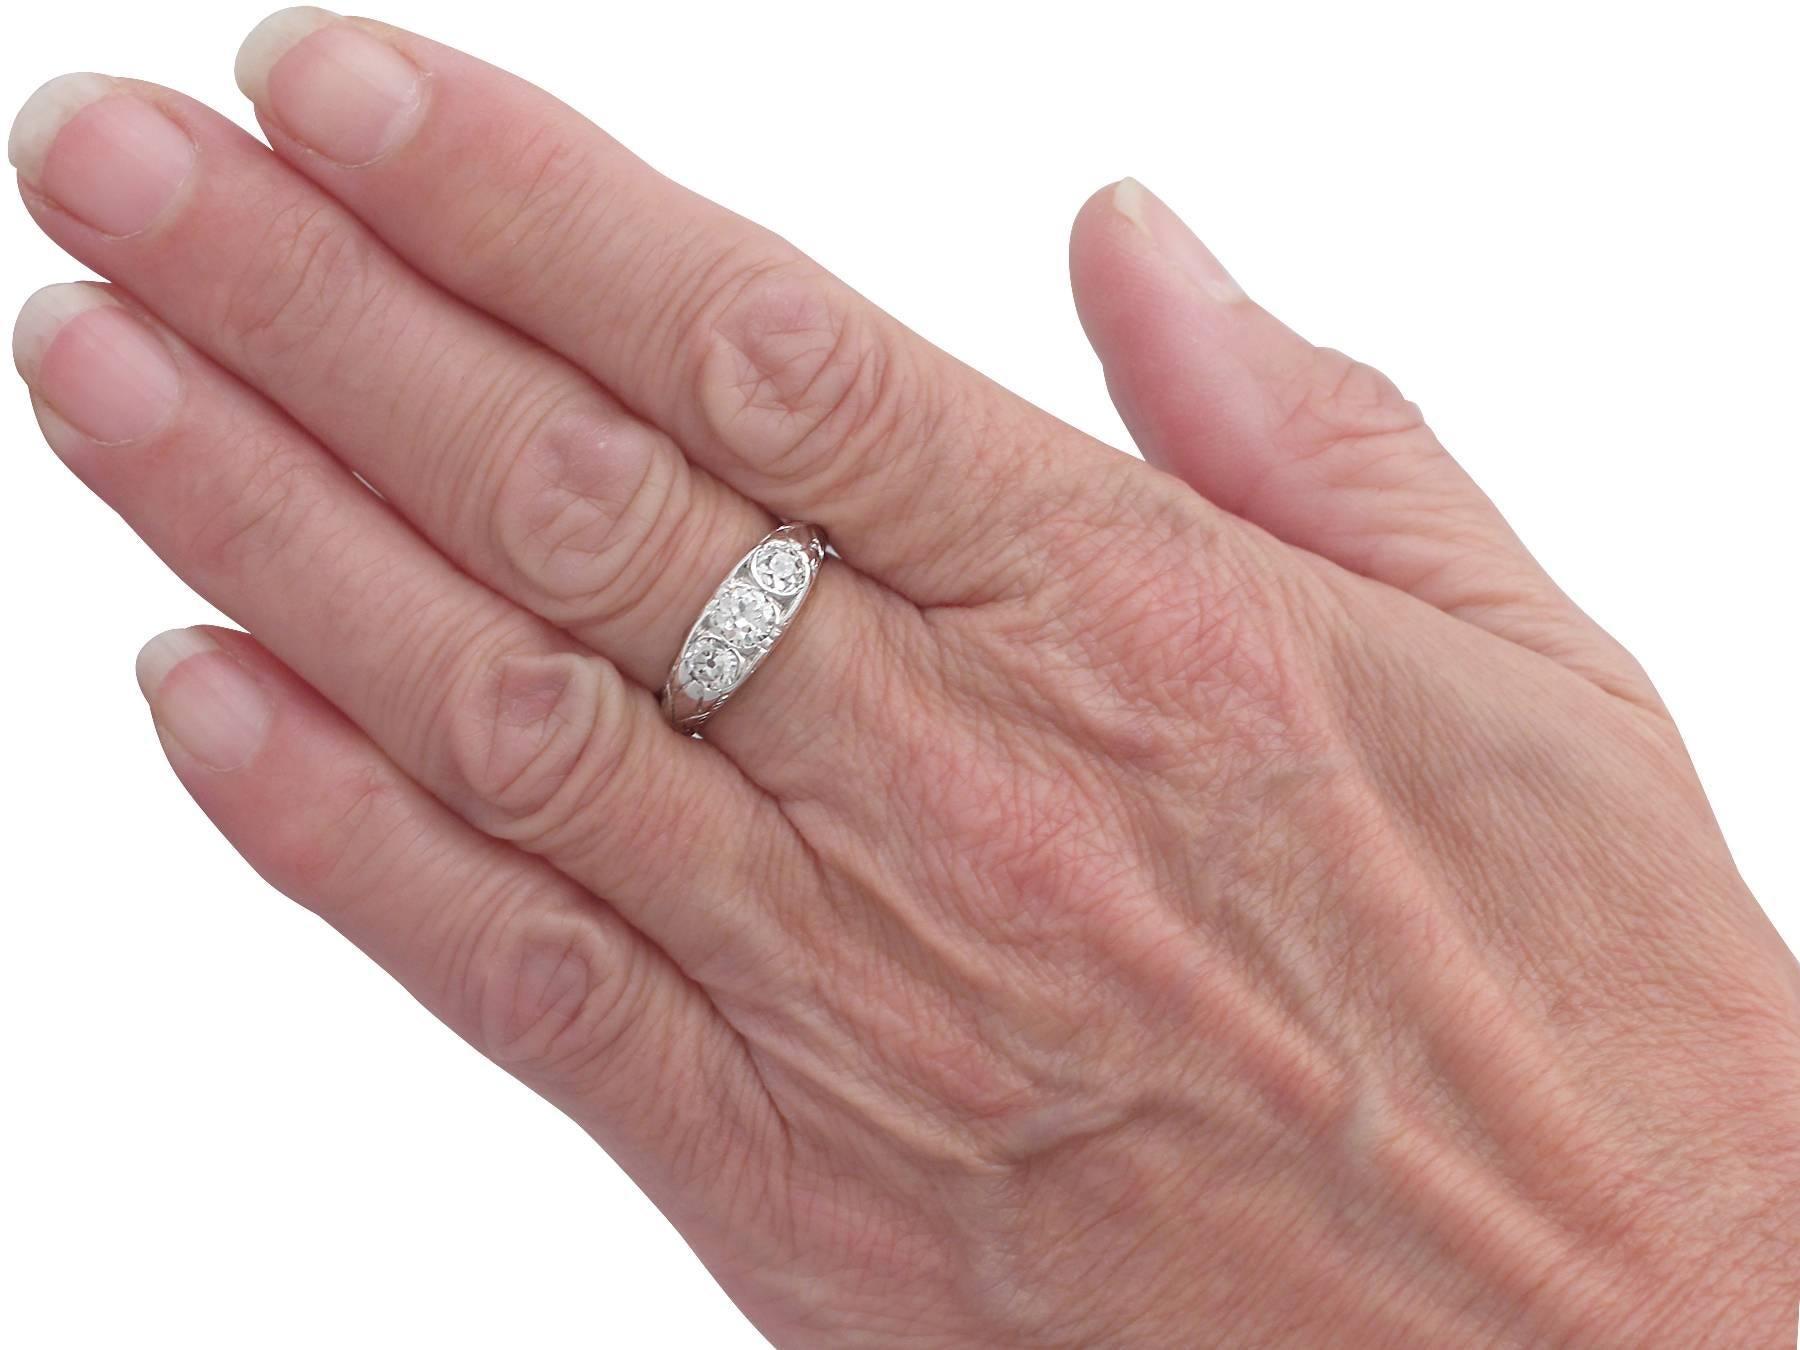 0.91Ct Diamond and Platinum Trilogy Ring - Antique French Circa 1910 ...